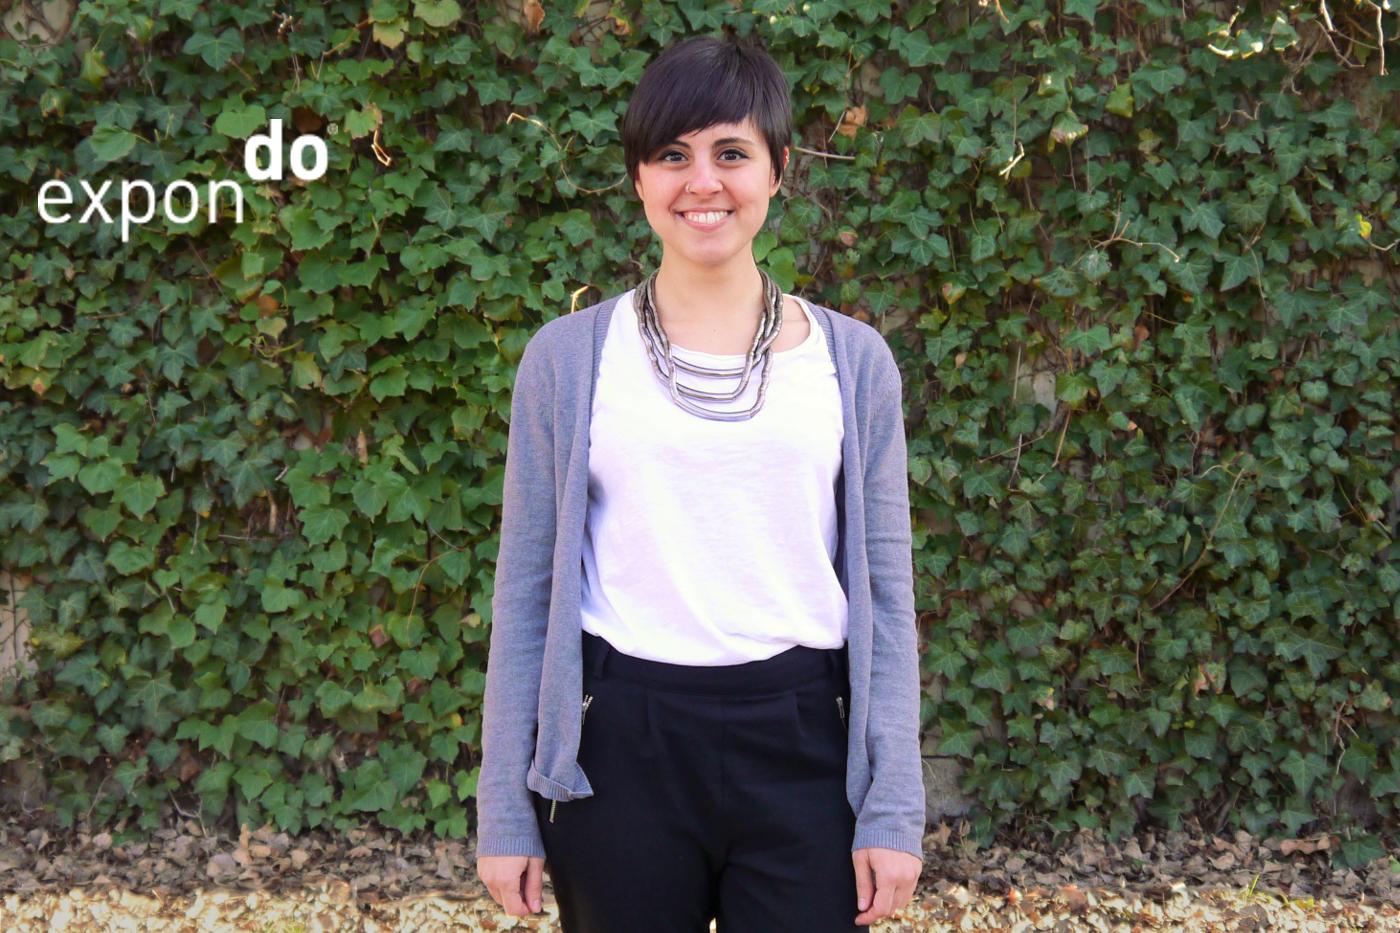 Interview mit Vanessa Pedullà, expondo content